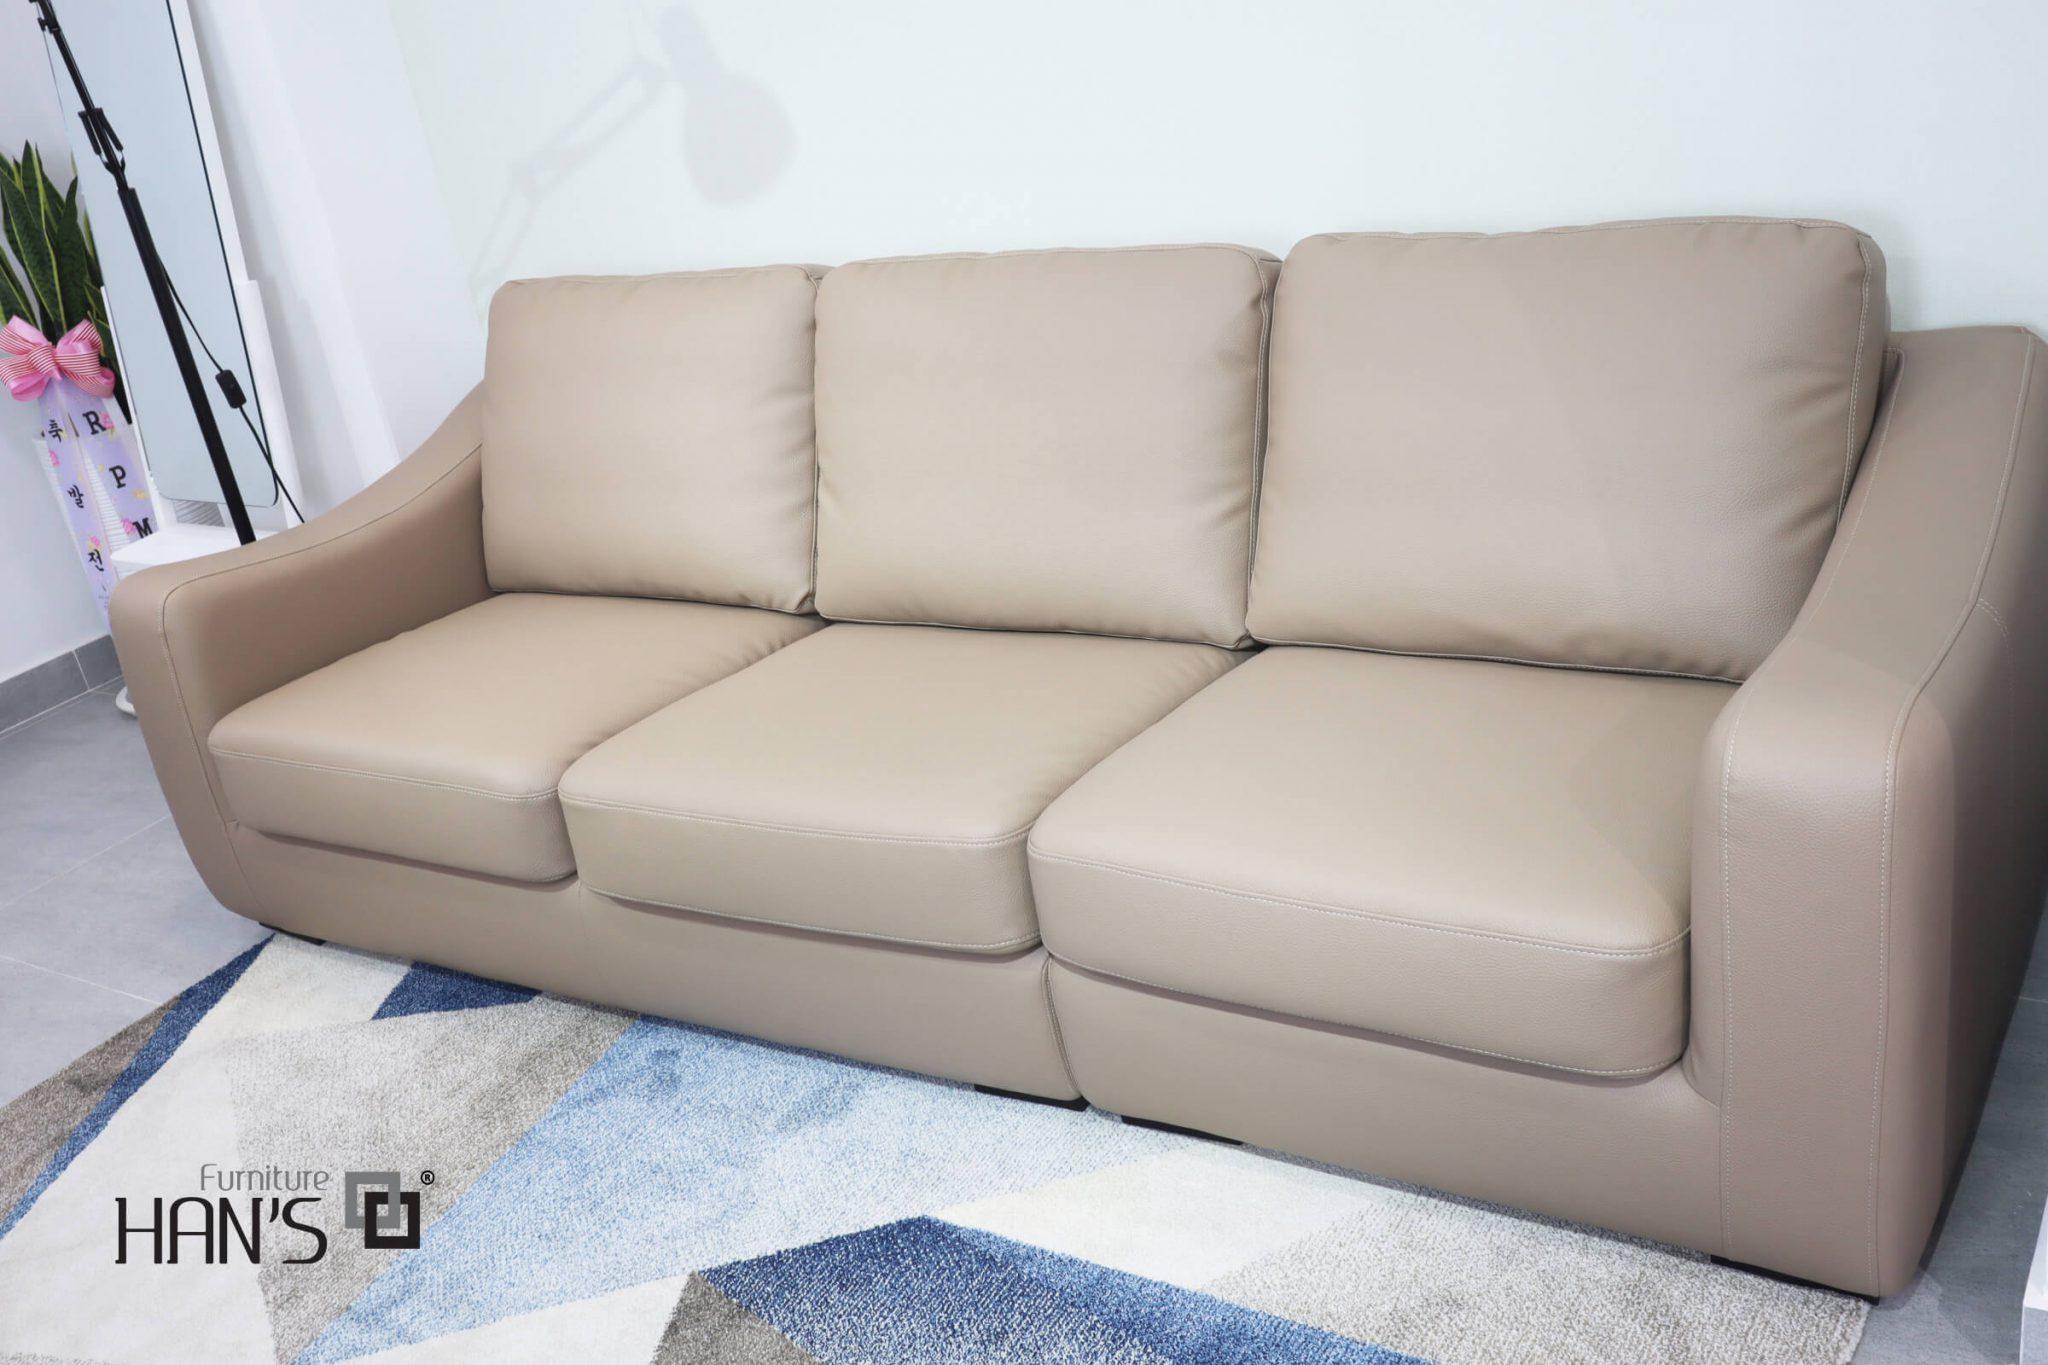 sofa da selina (2)